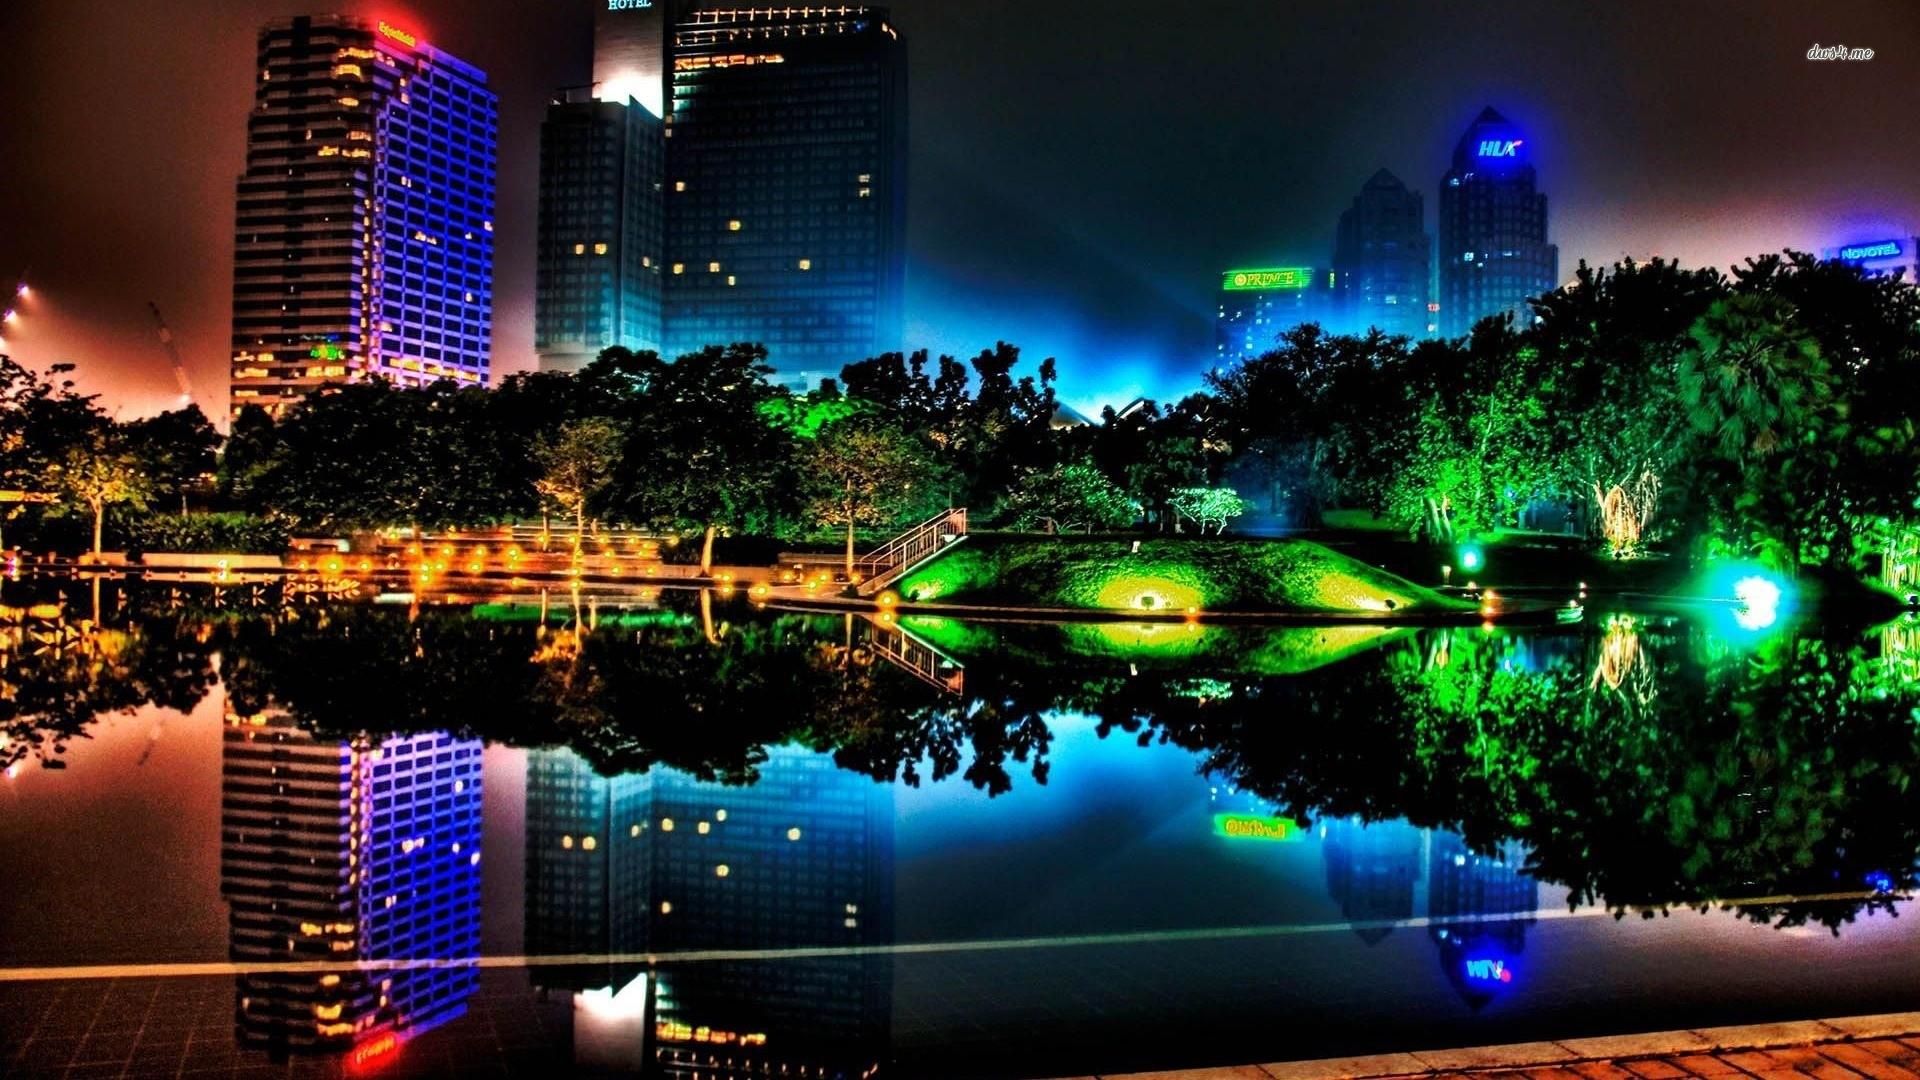 Japan cityscapes futuristic digital art artwork wallpaper